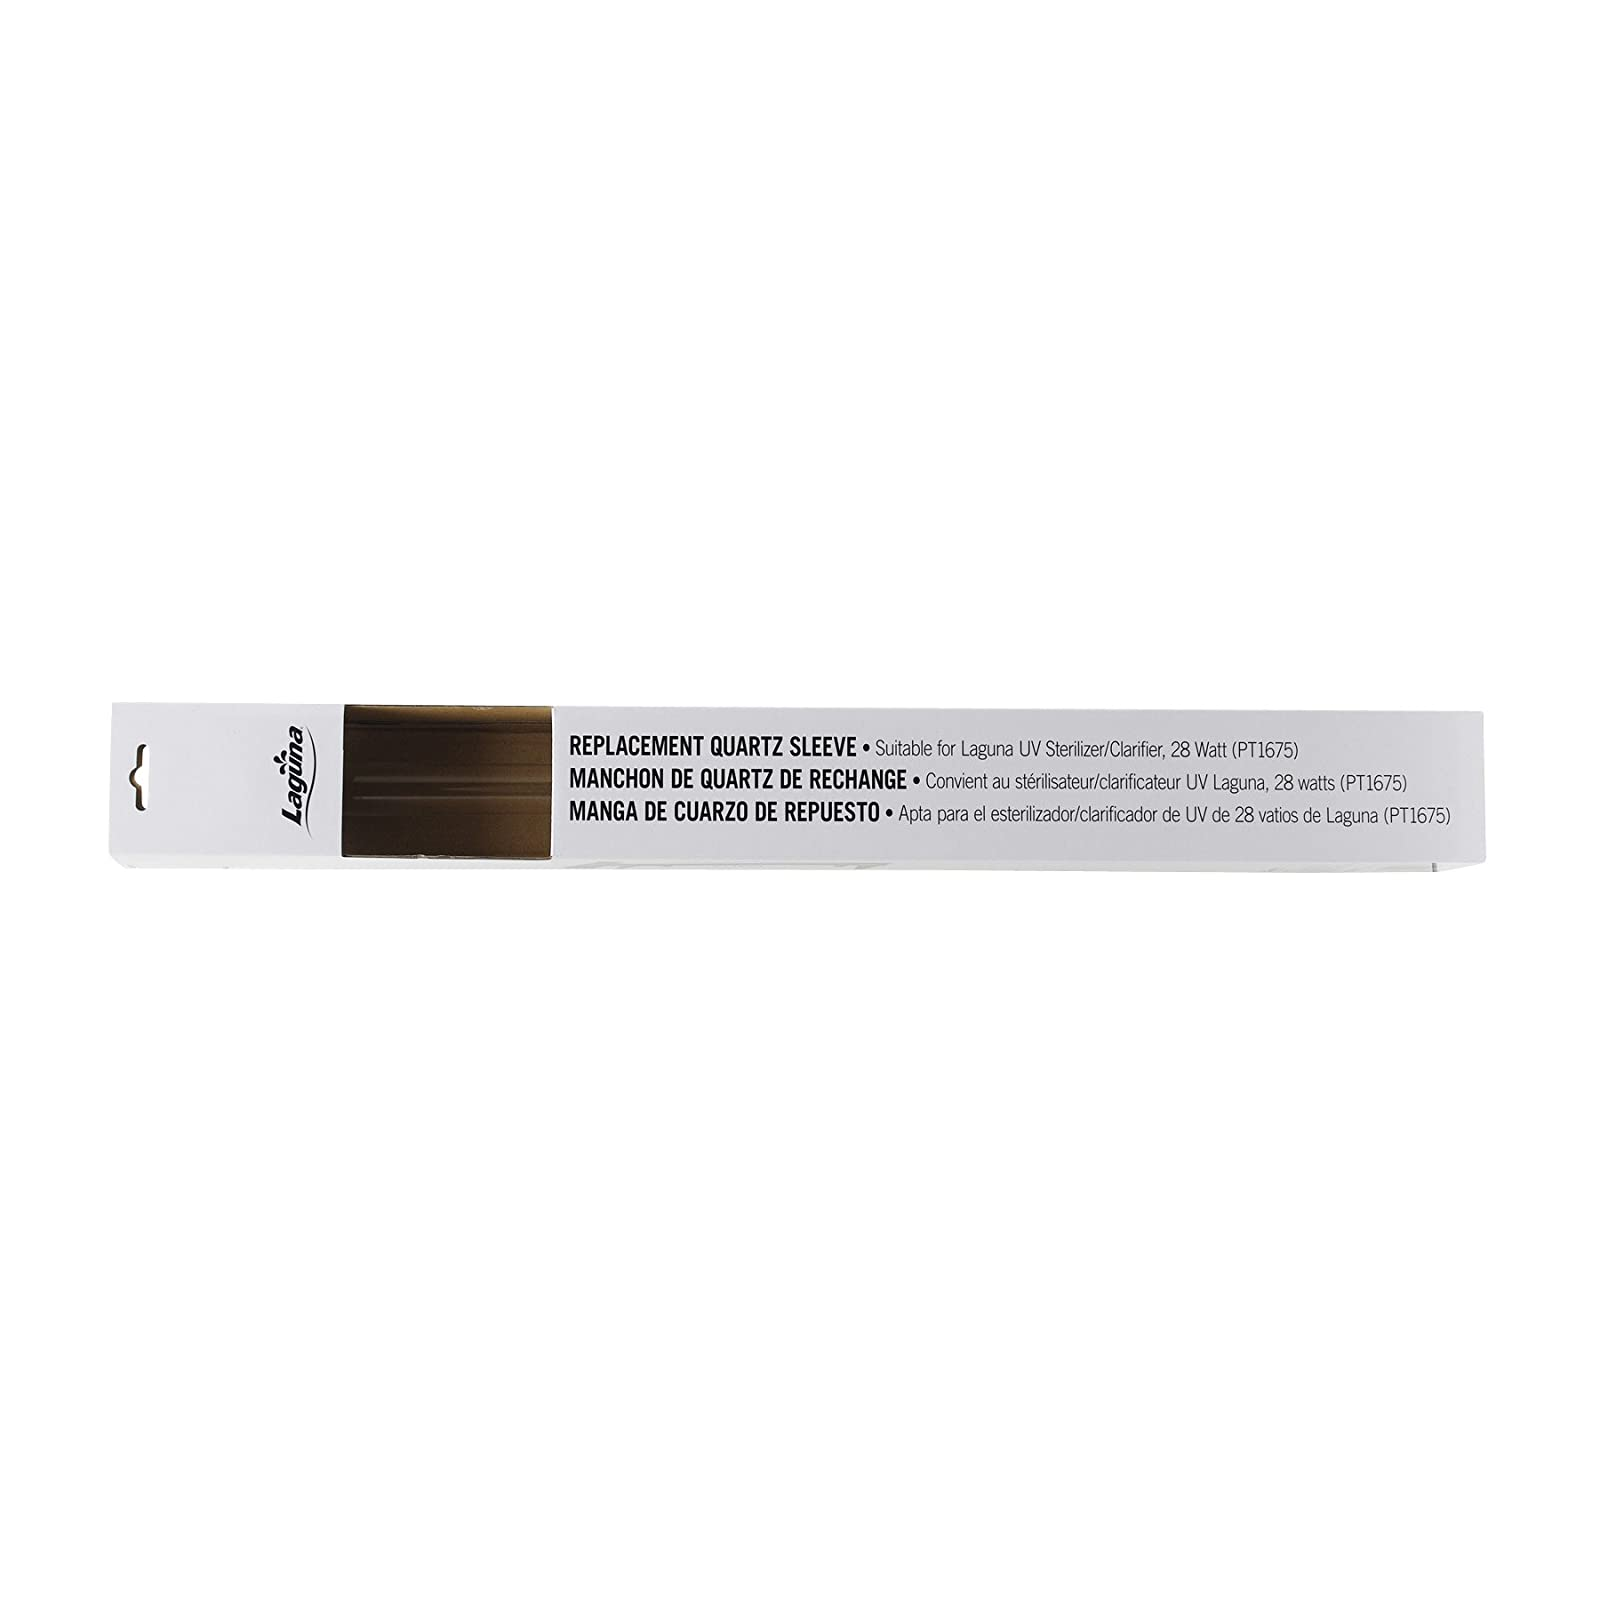 Replacement Quartz SleeveLaguna UV Sterilizer/Clarifier 2000 ( PT1677 - 1